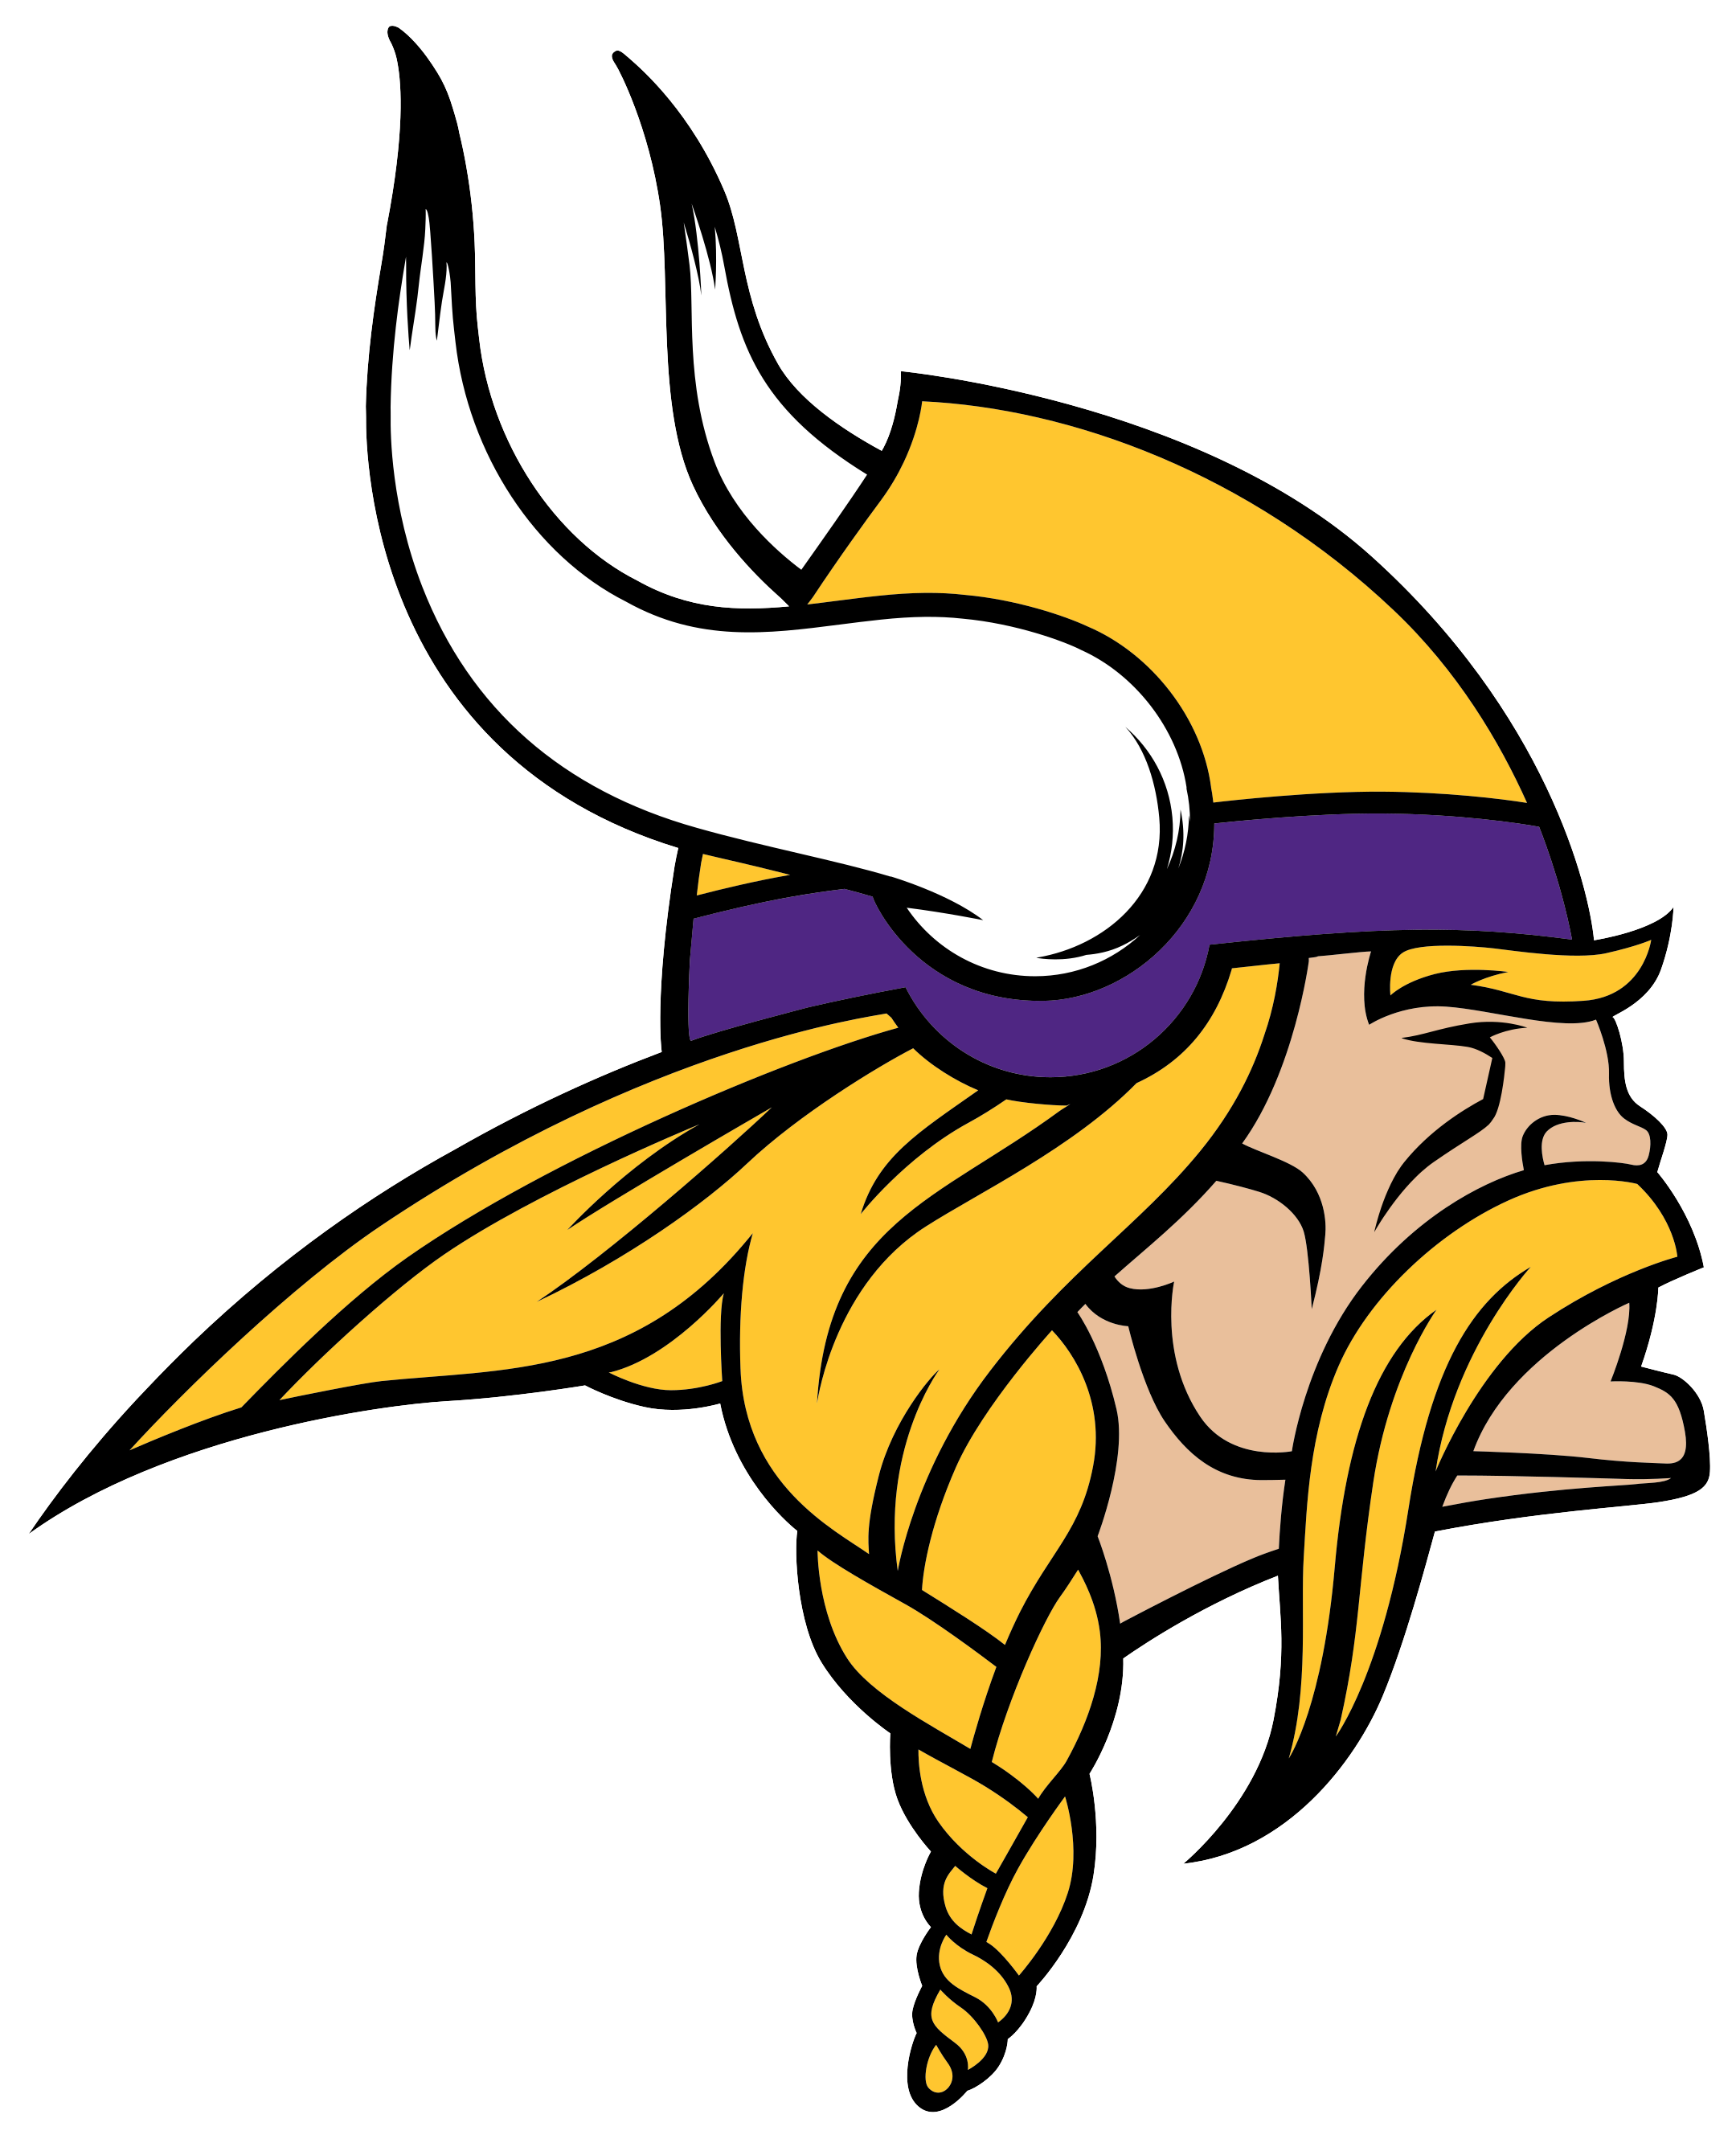 minnesota vikings logo 1 - Minnesota Vikings Logo